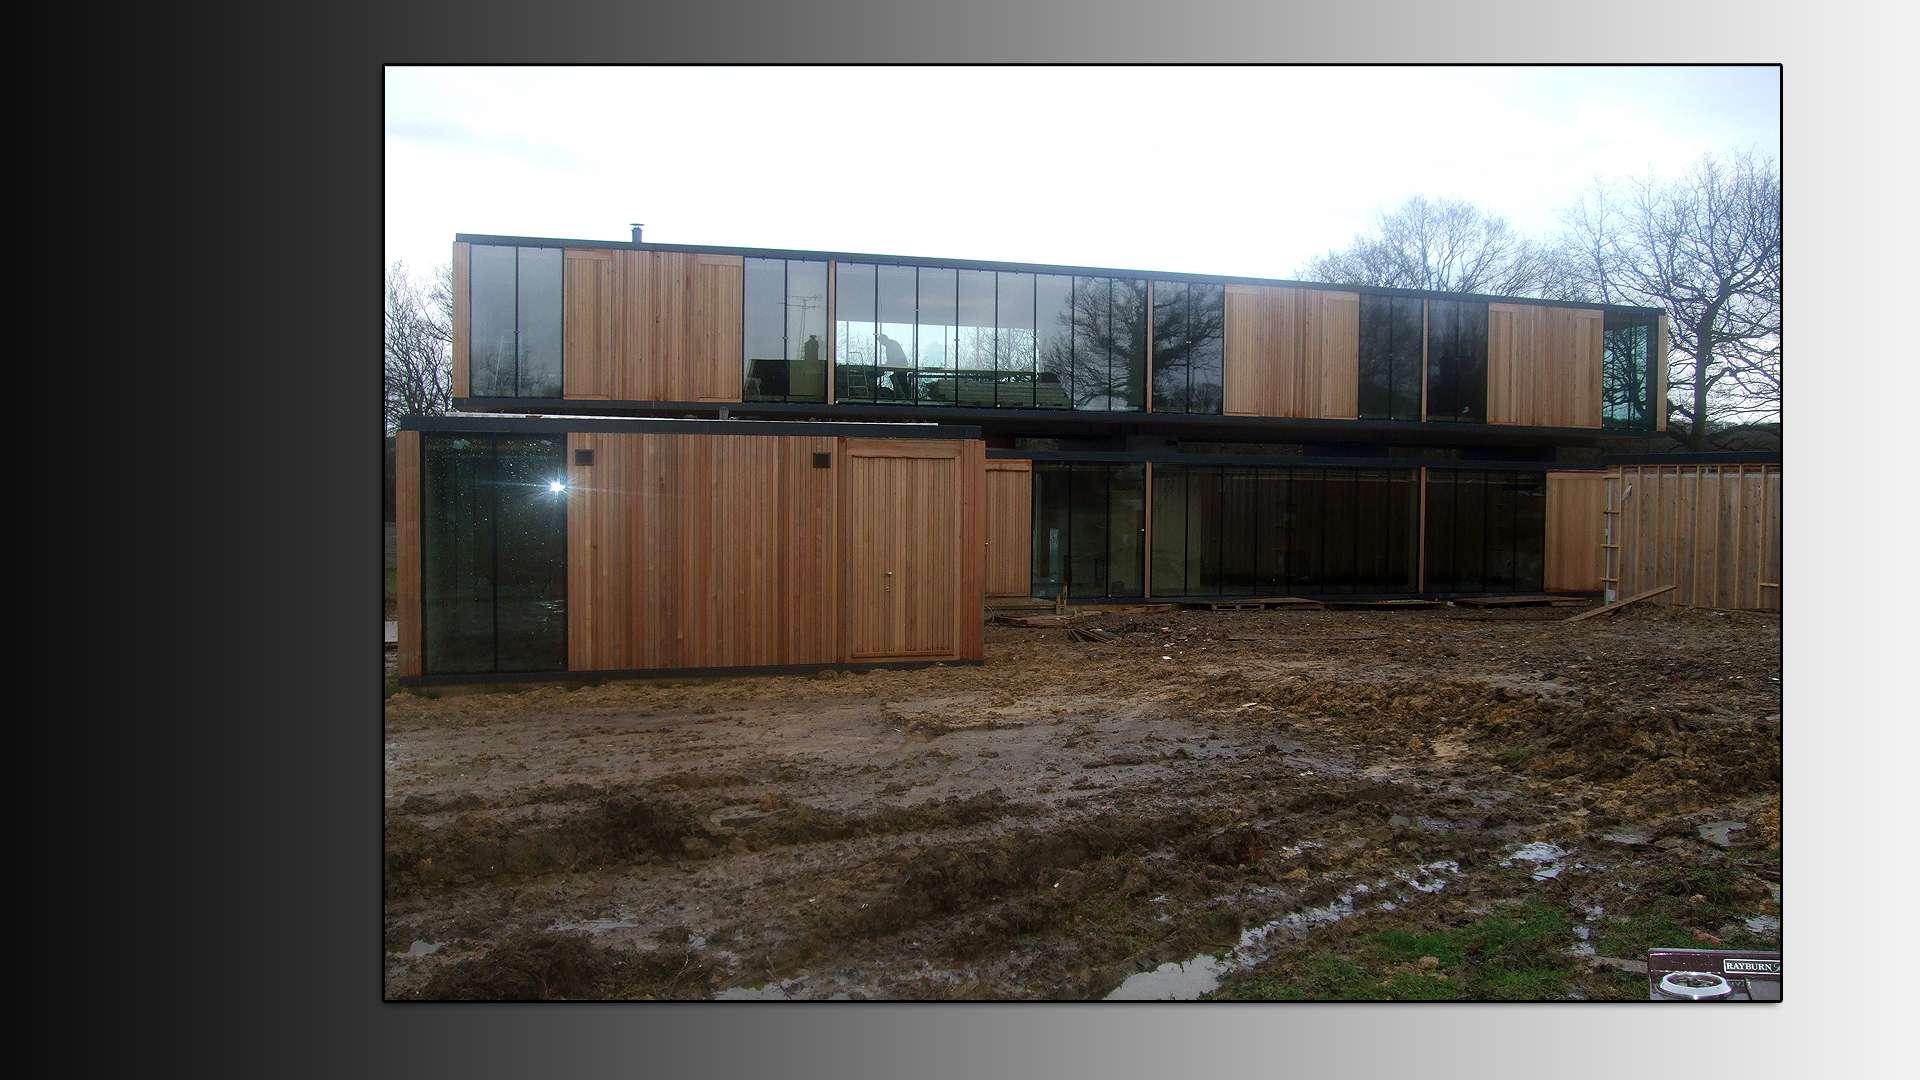 Headcorn minimalist house - Headcorn Minimalist House 42